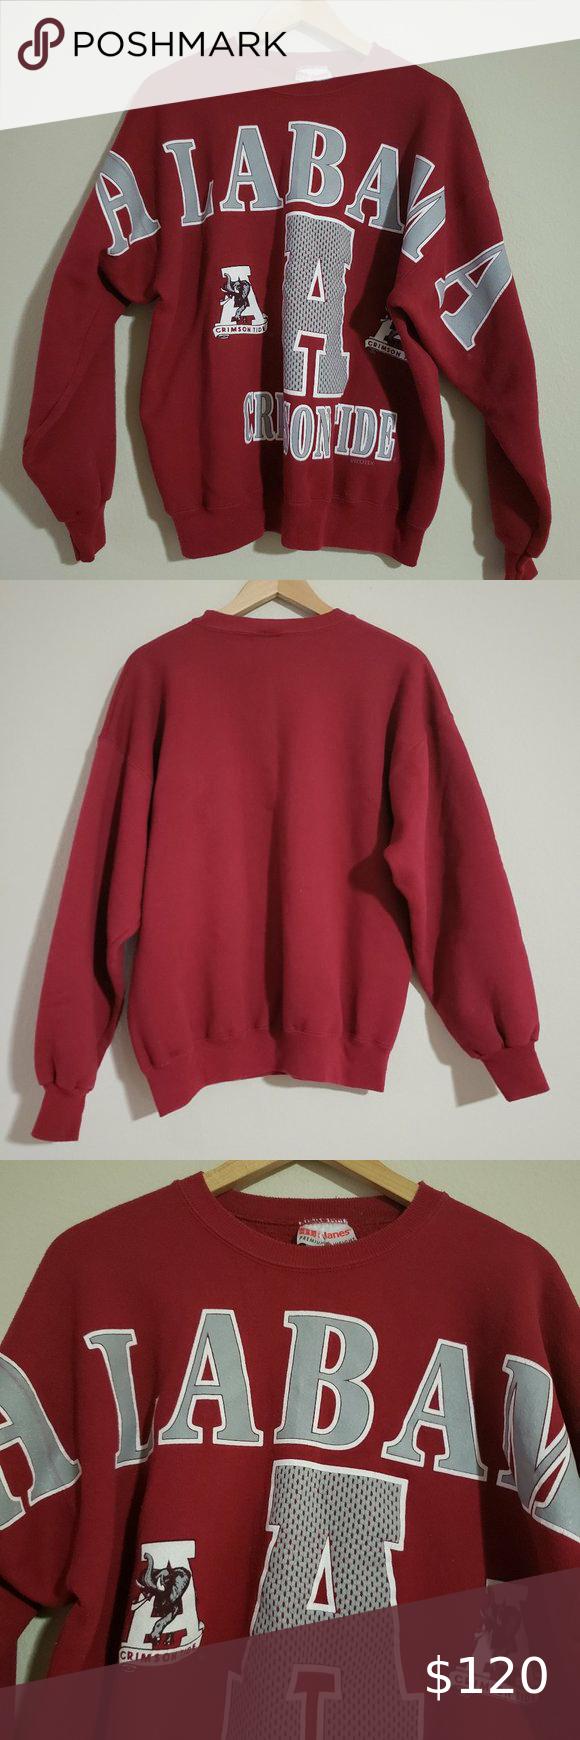 Vintage Alabama Crimson Tide Sweatshirt Xl Sweatshirts Sweatshirt Shirt Alabama Crimson Tide [ 1740 x 580 Pixel ]